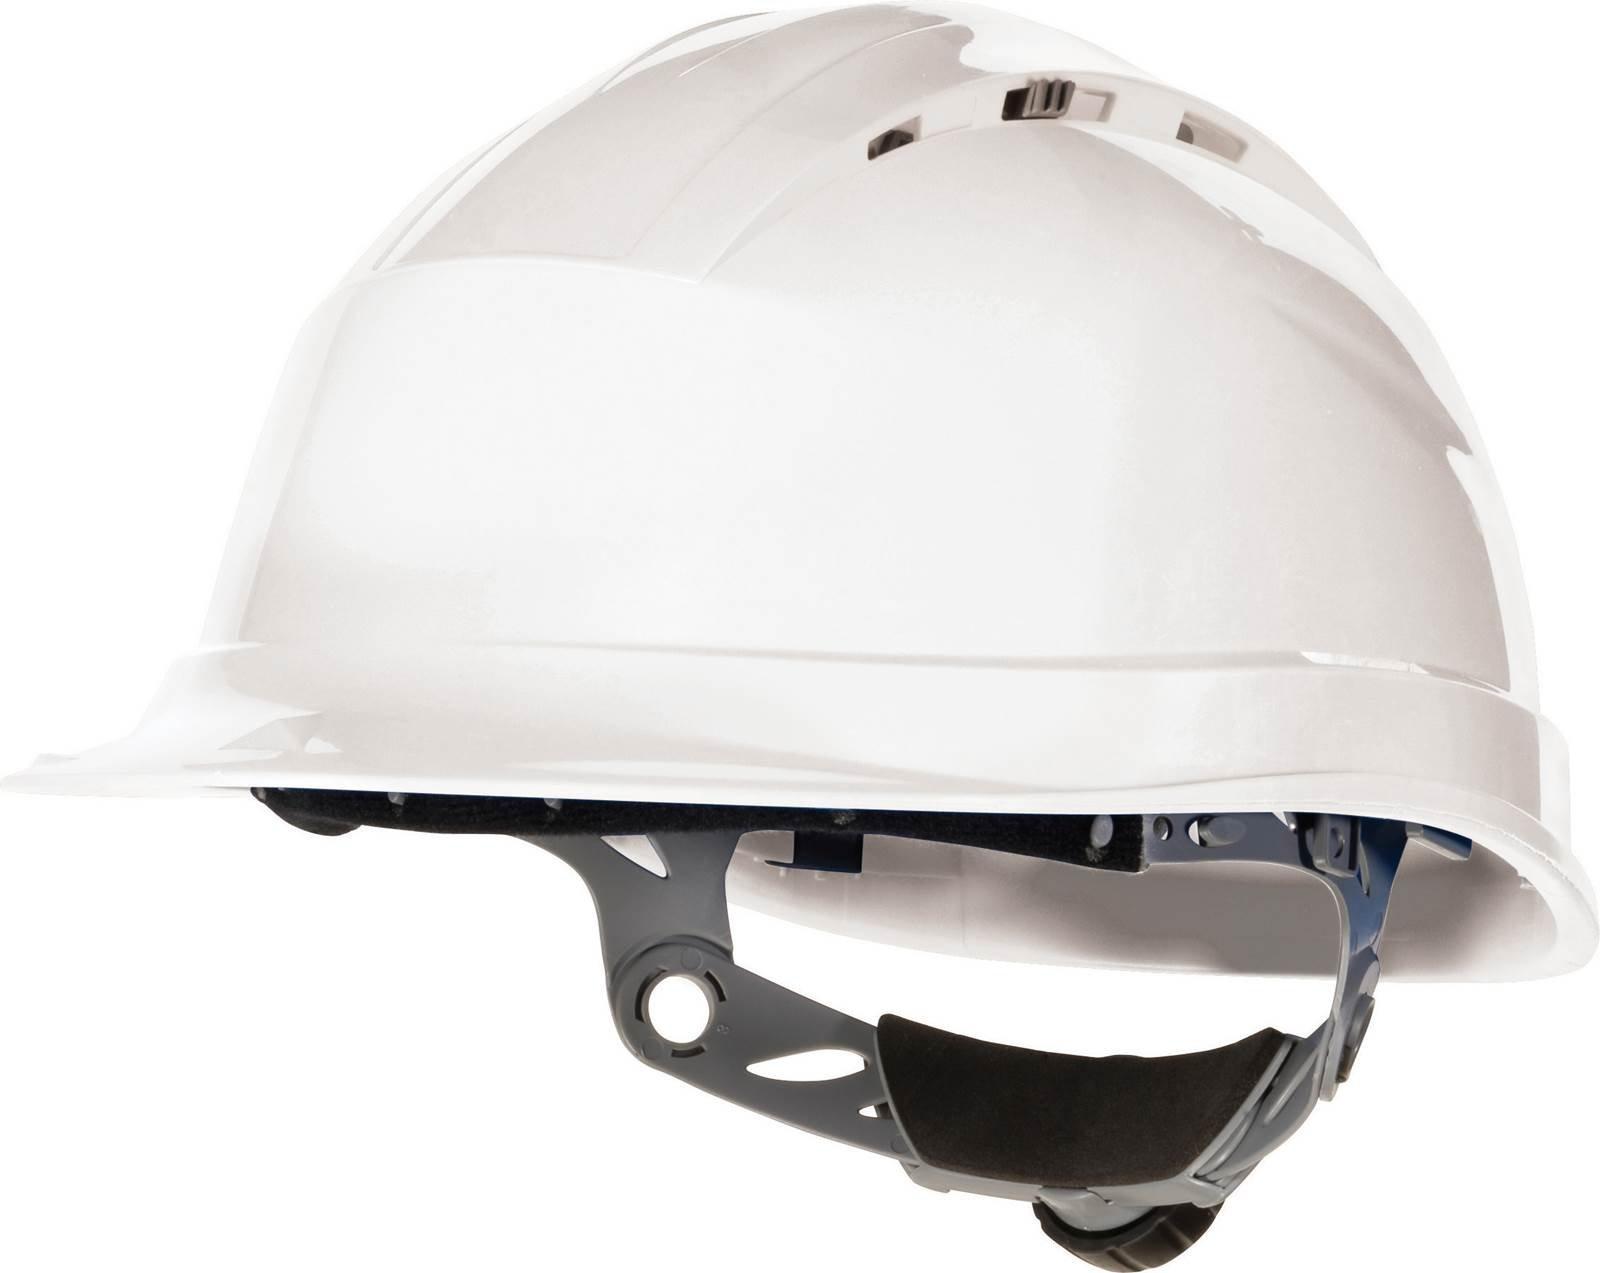 Venitex Quartz IV Ventilated Safety Hard Hat Helmet Red